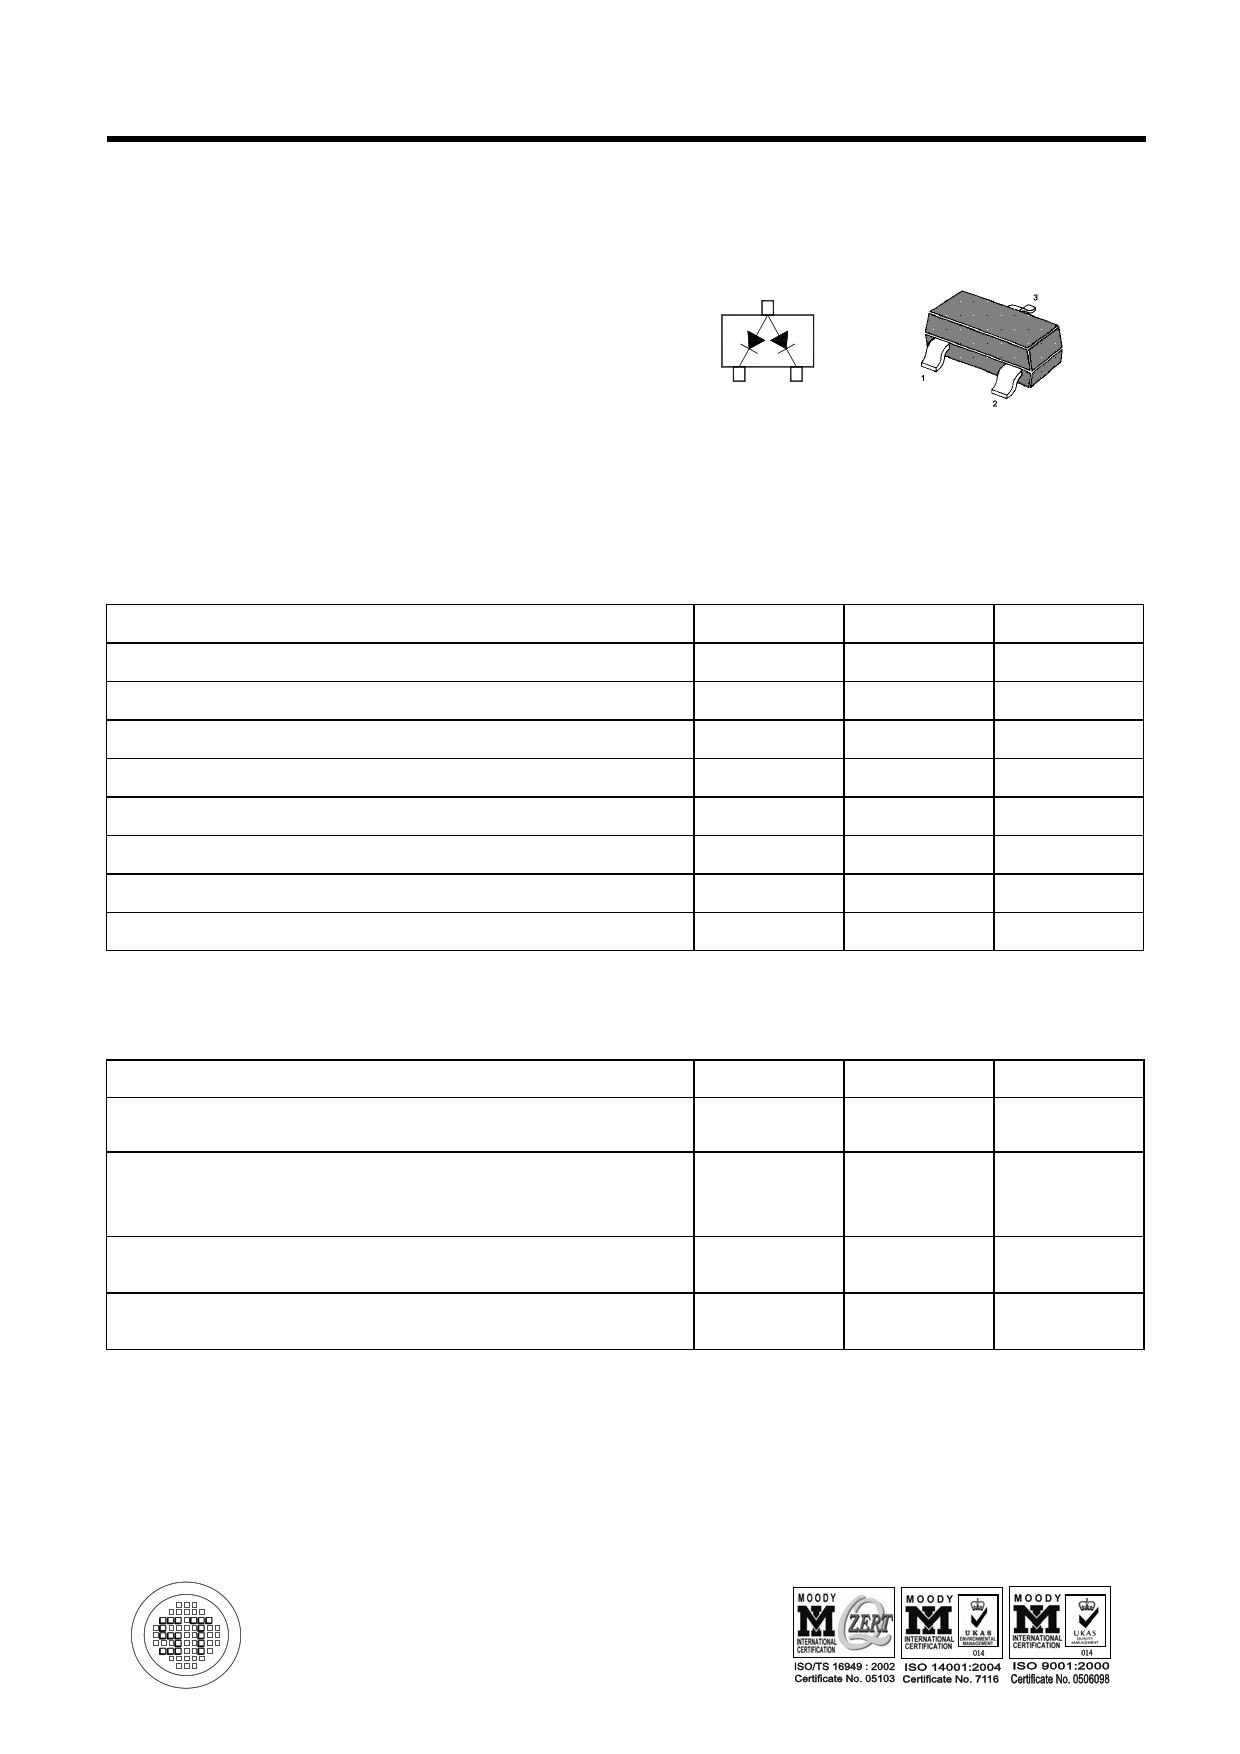 1SS181 Datasheet, 1SS181 PDF,ピン配置, 機能